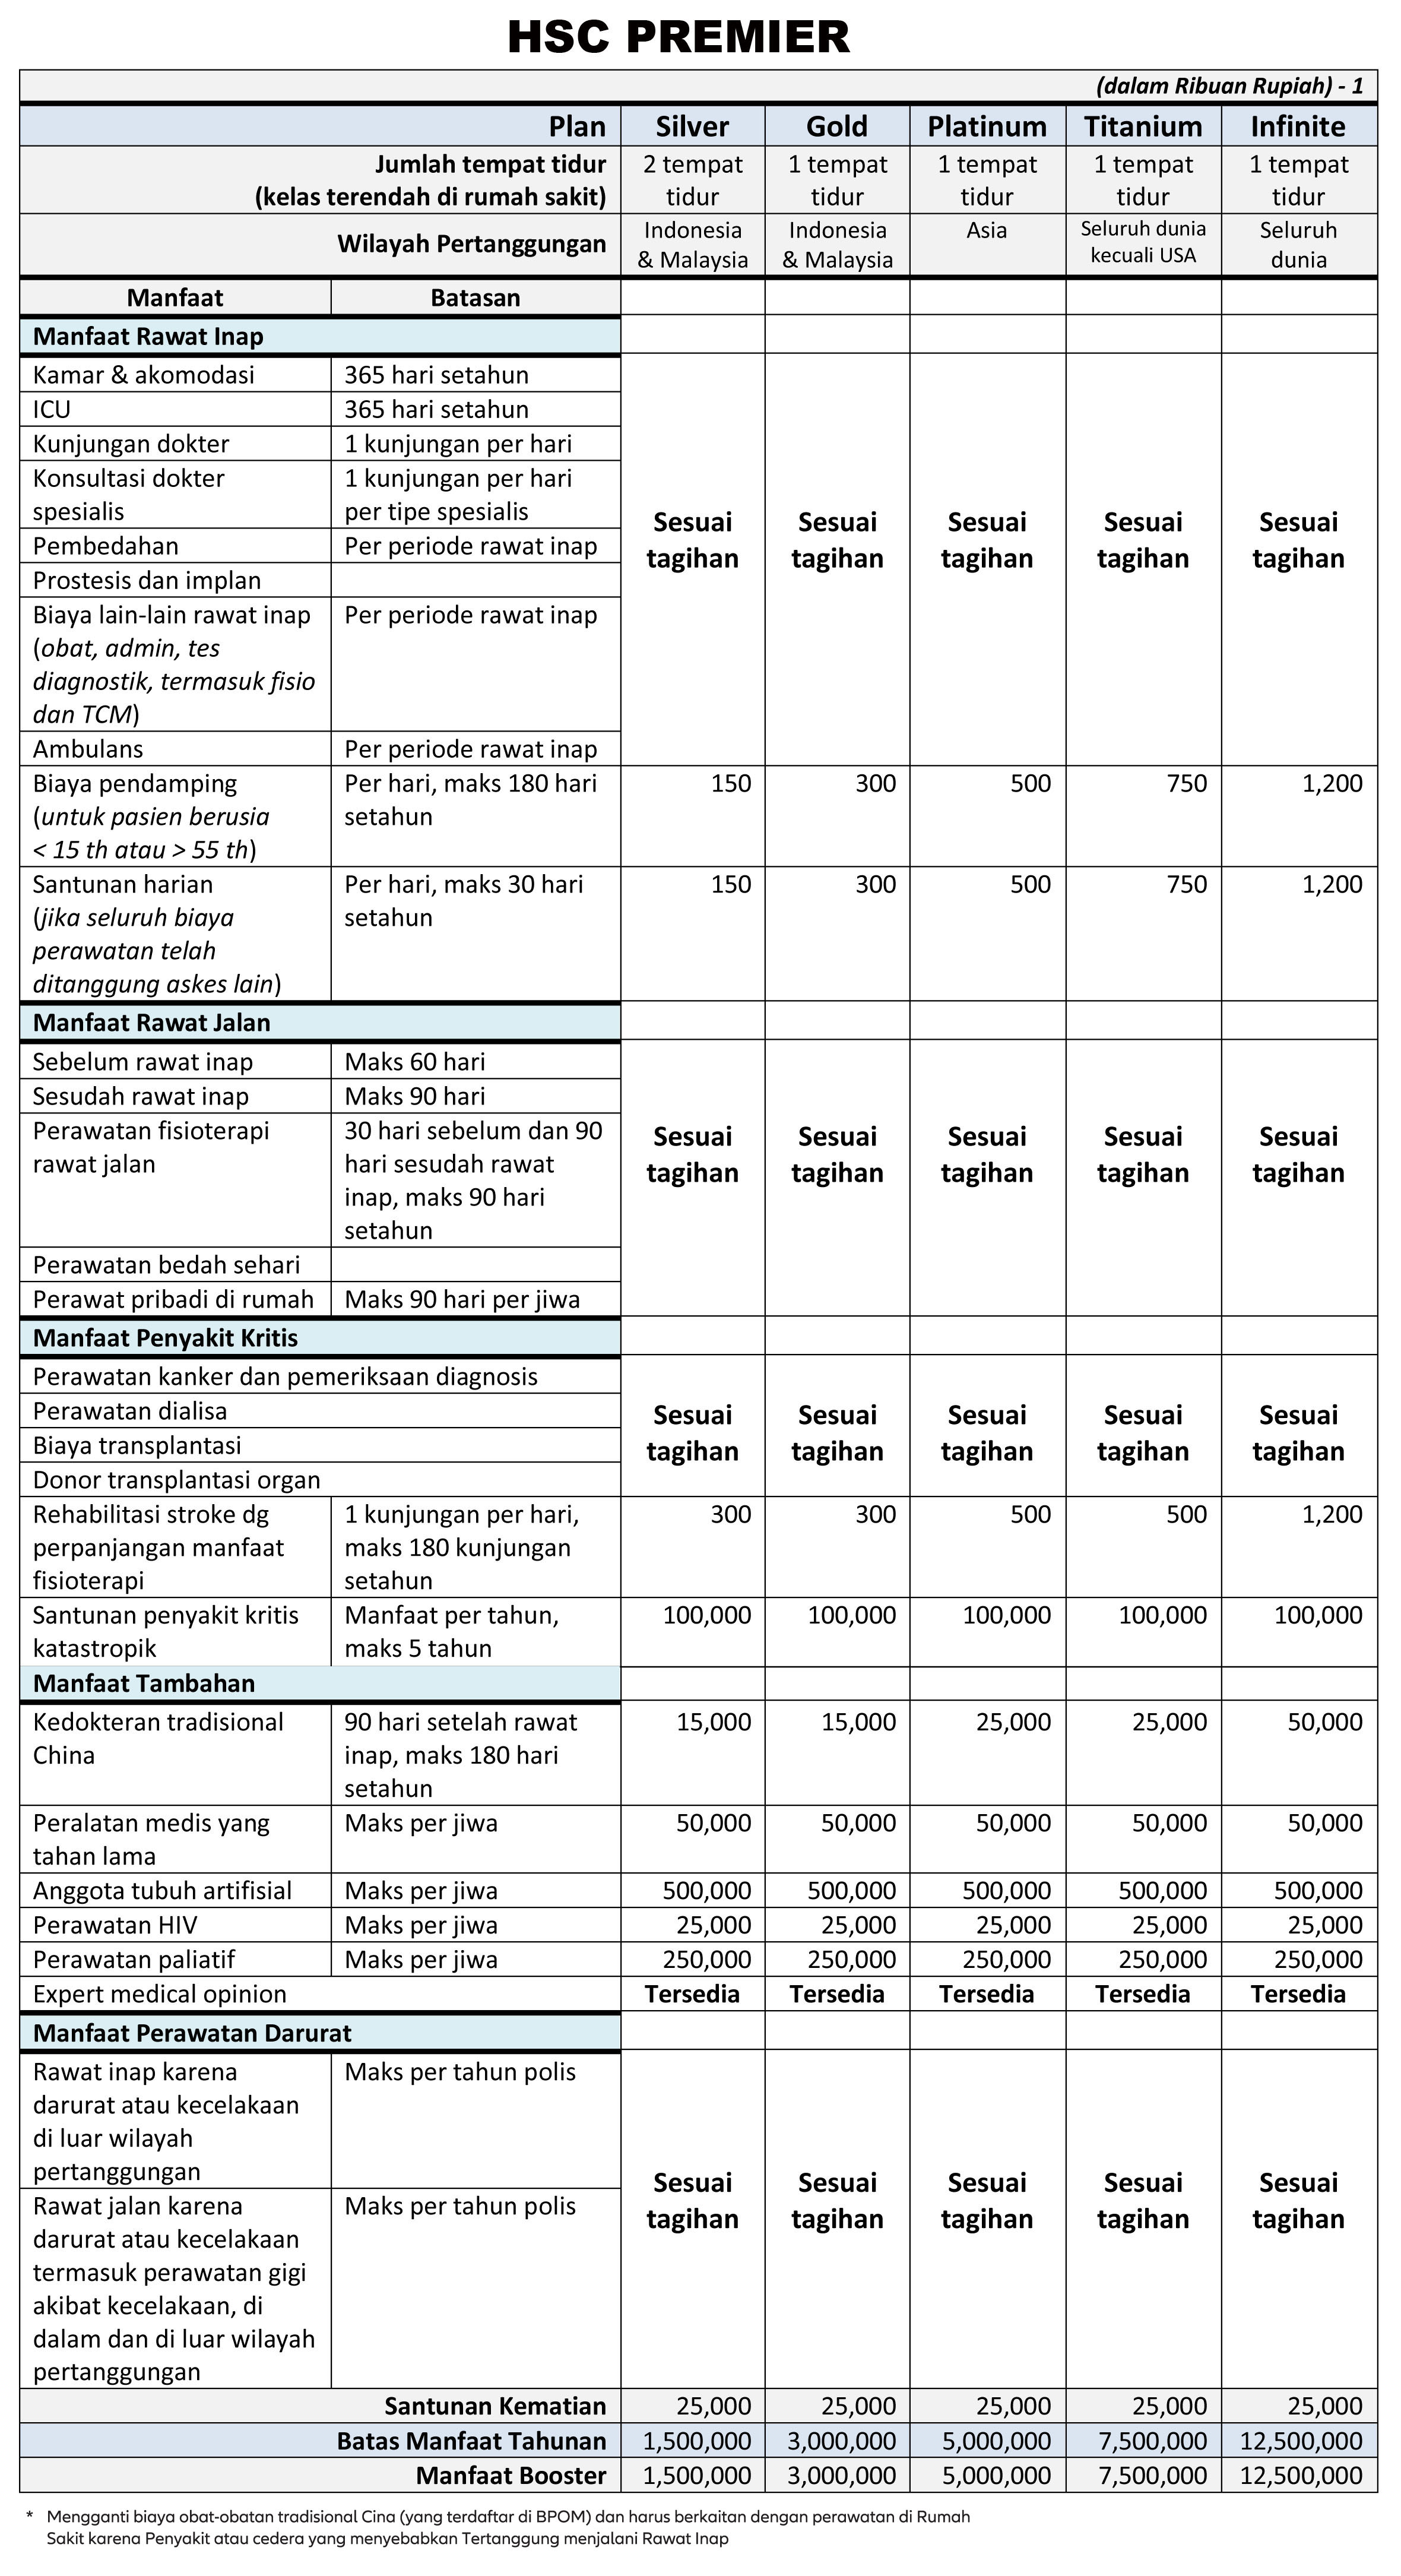 tabel manfaat hsc premier allianz